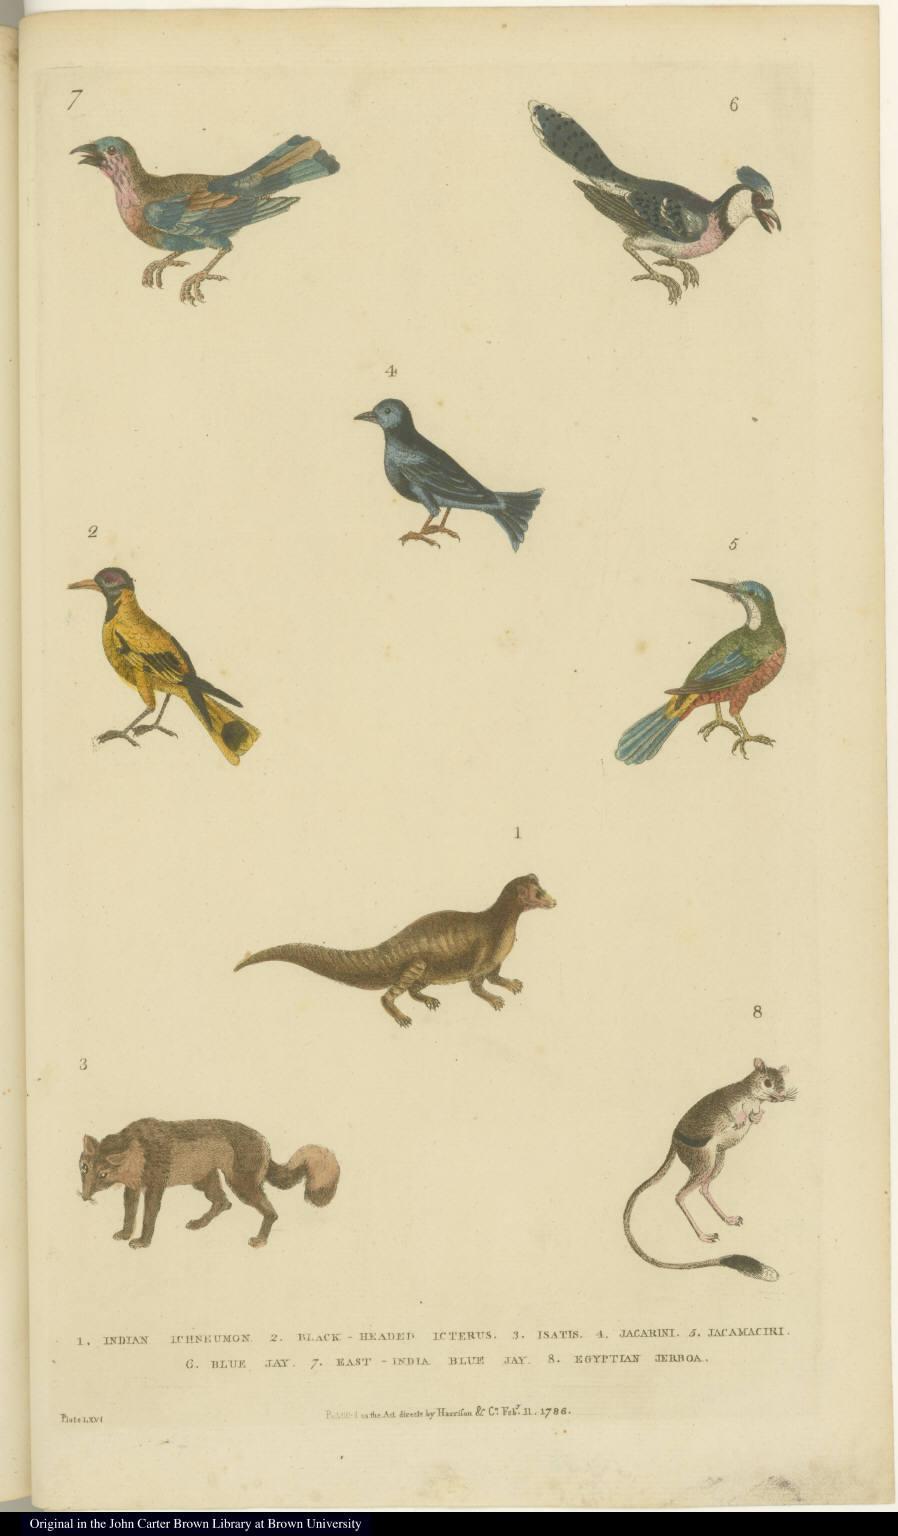 [Birds and small mammals]